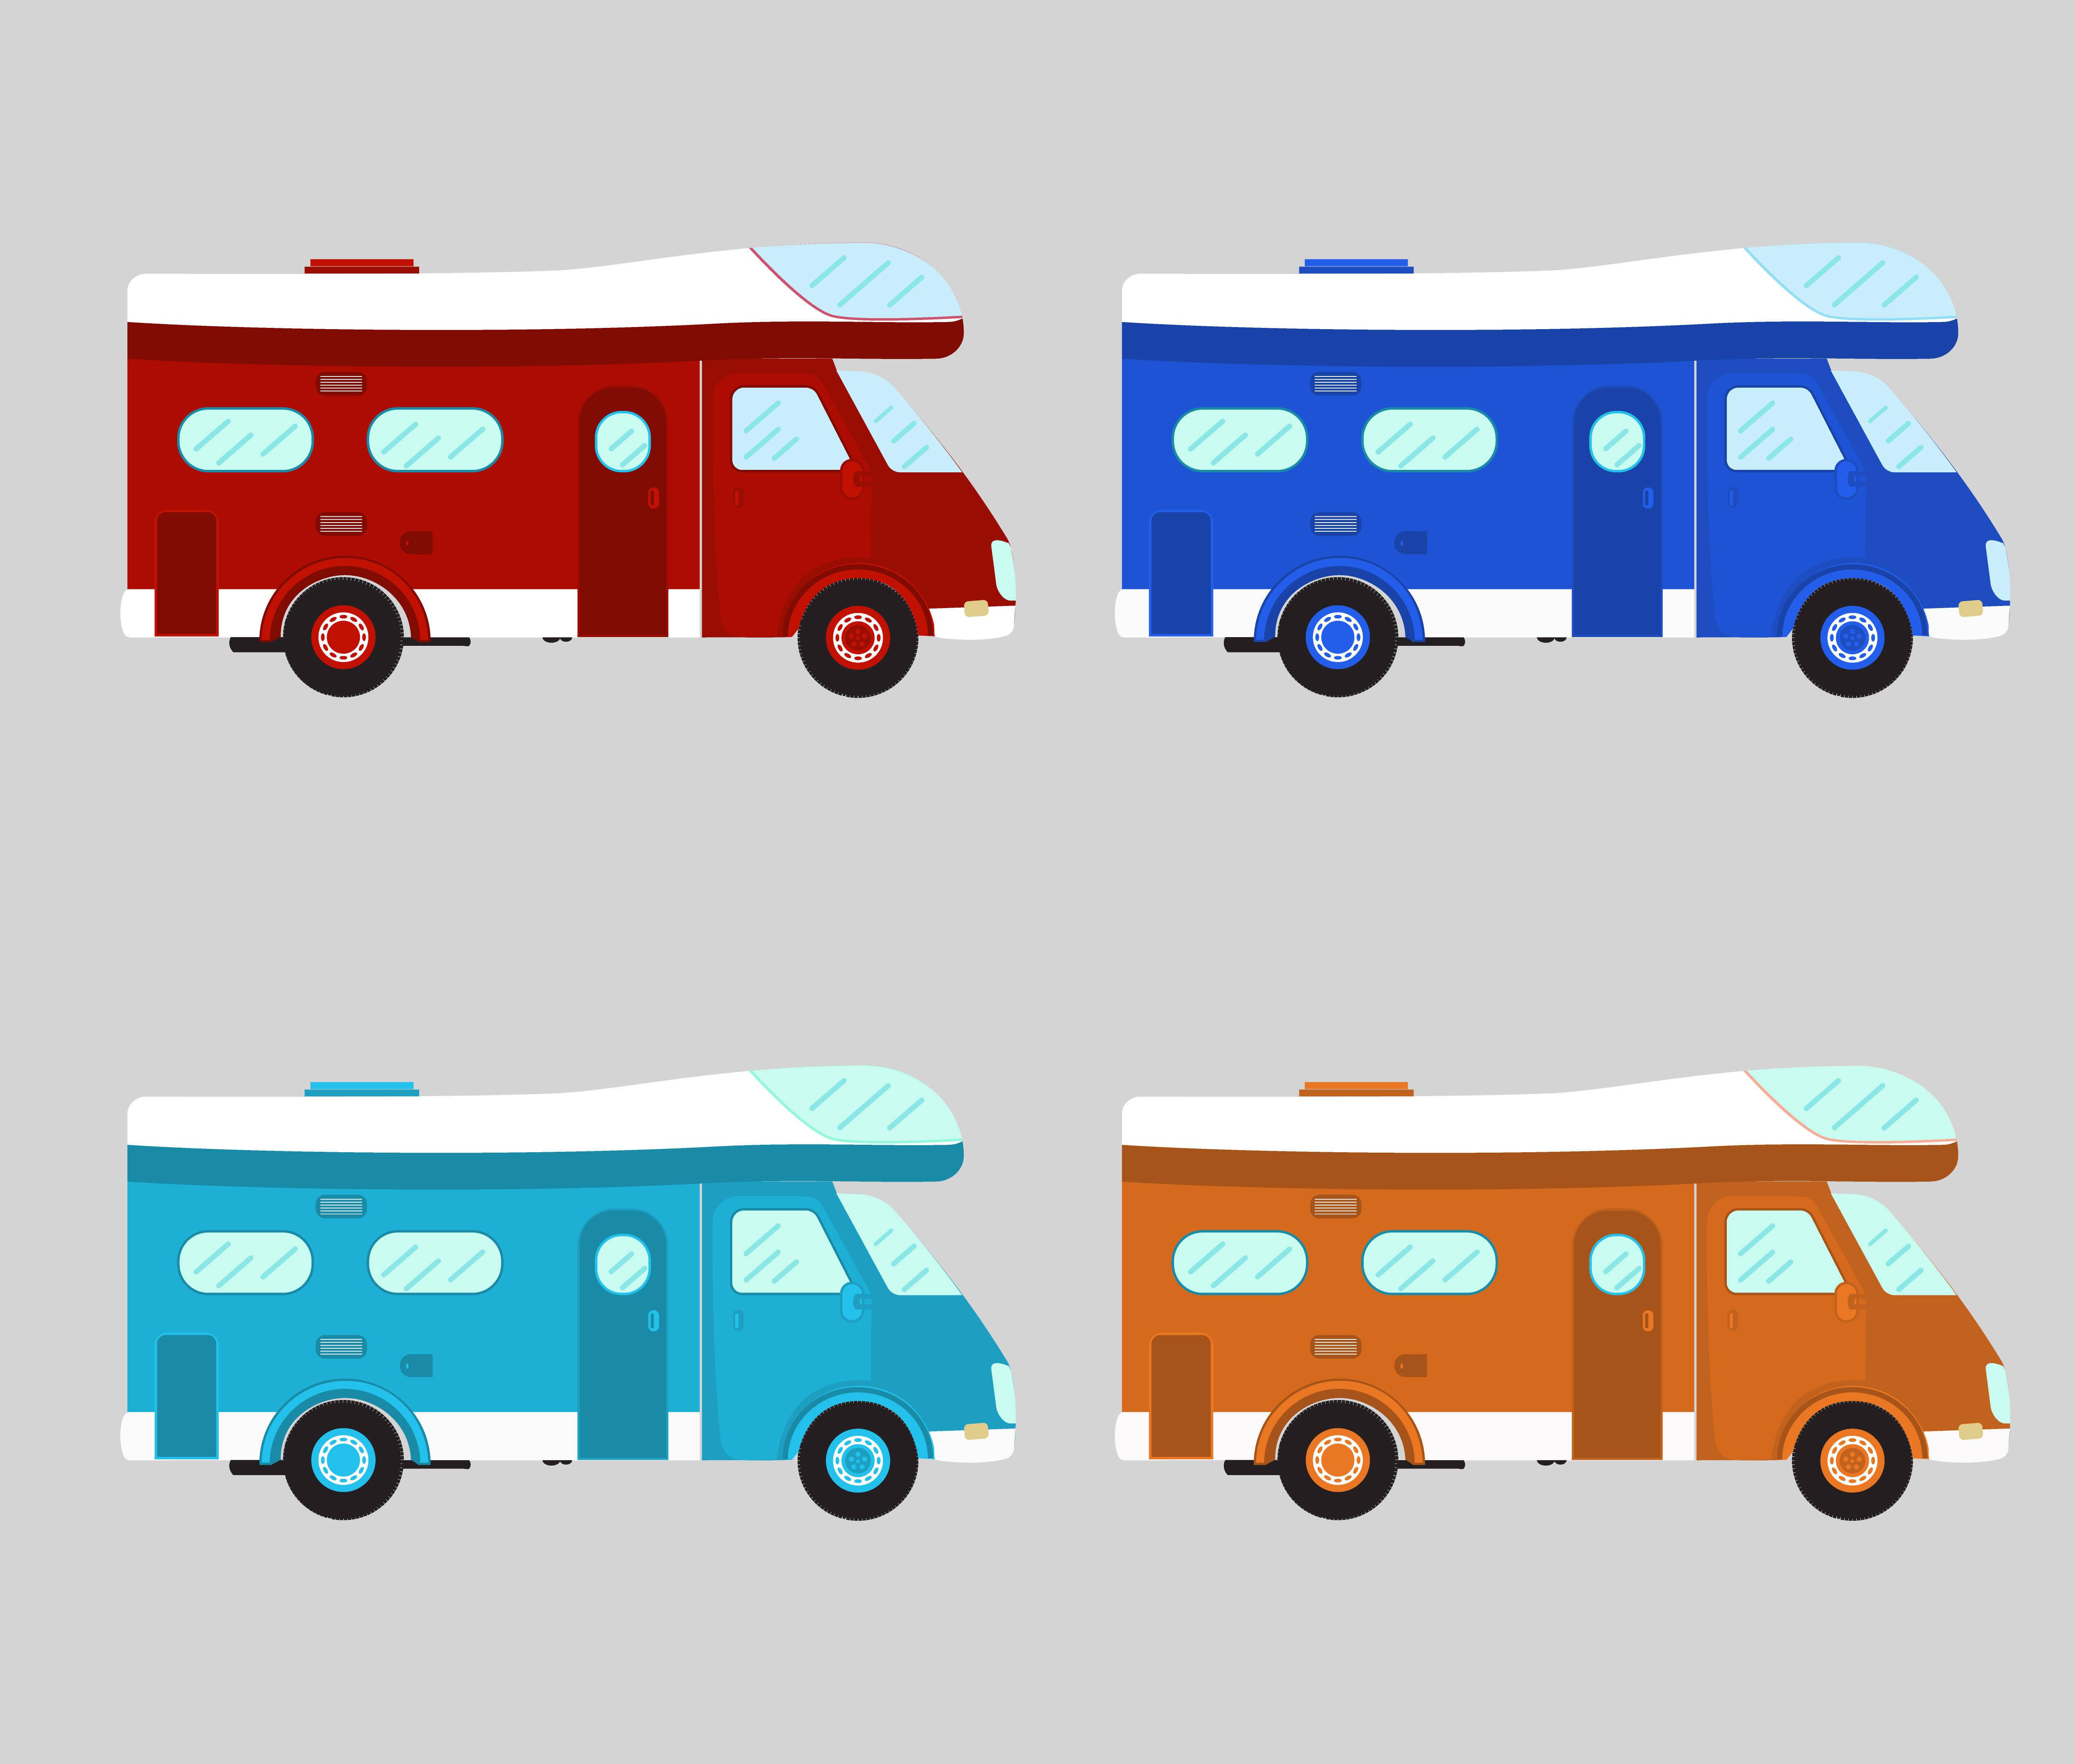 Franquicia de alquiler de caravanas